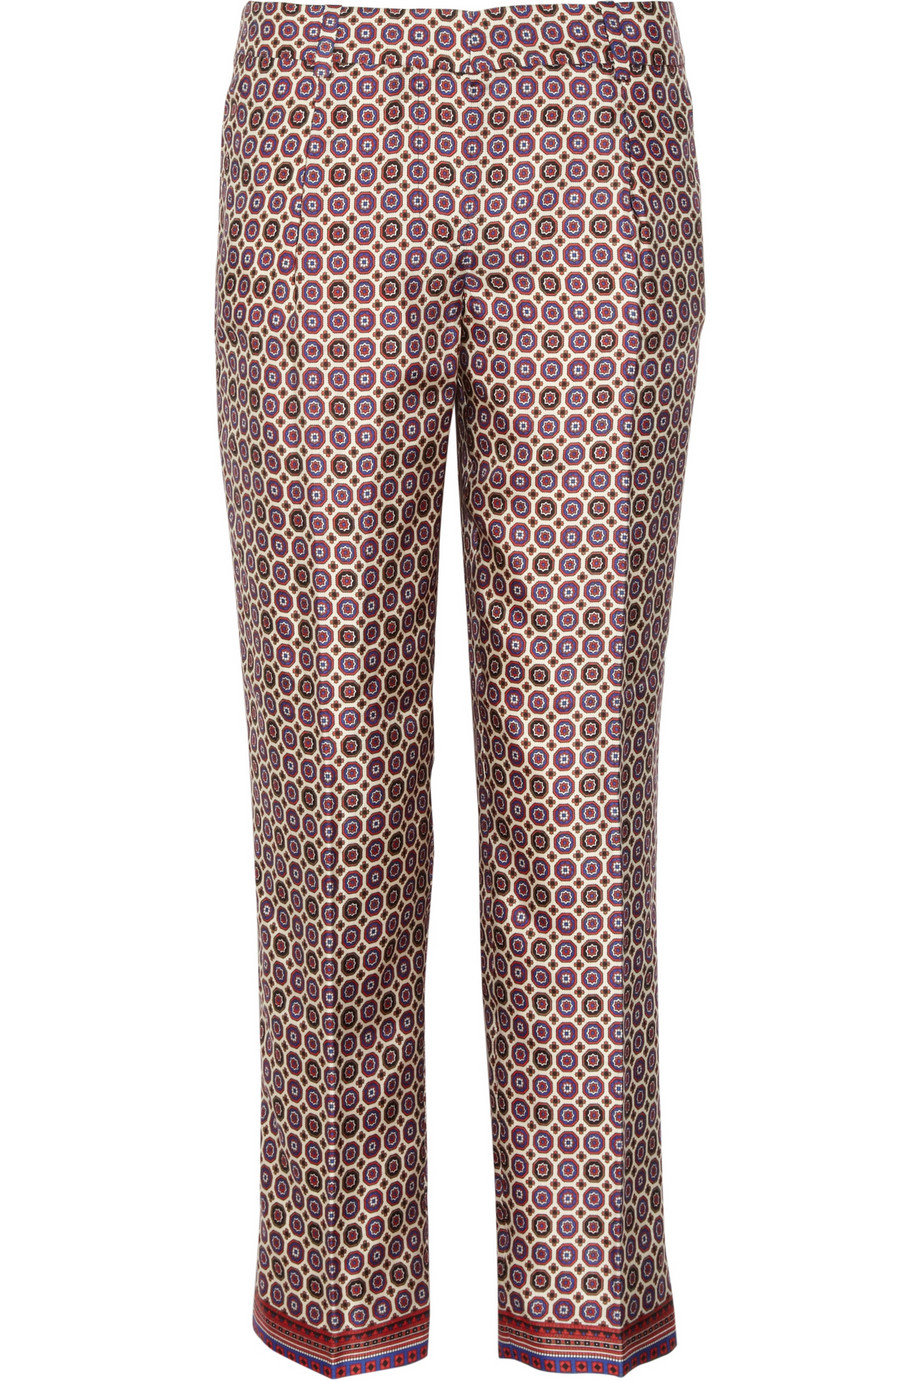 J.crew Café Printed Silk-twill Capri Pants in Multicolor | Lyst